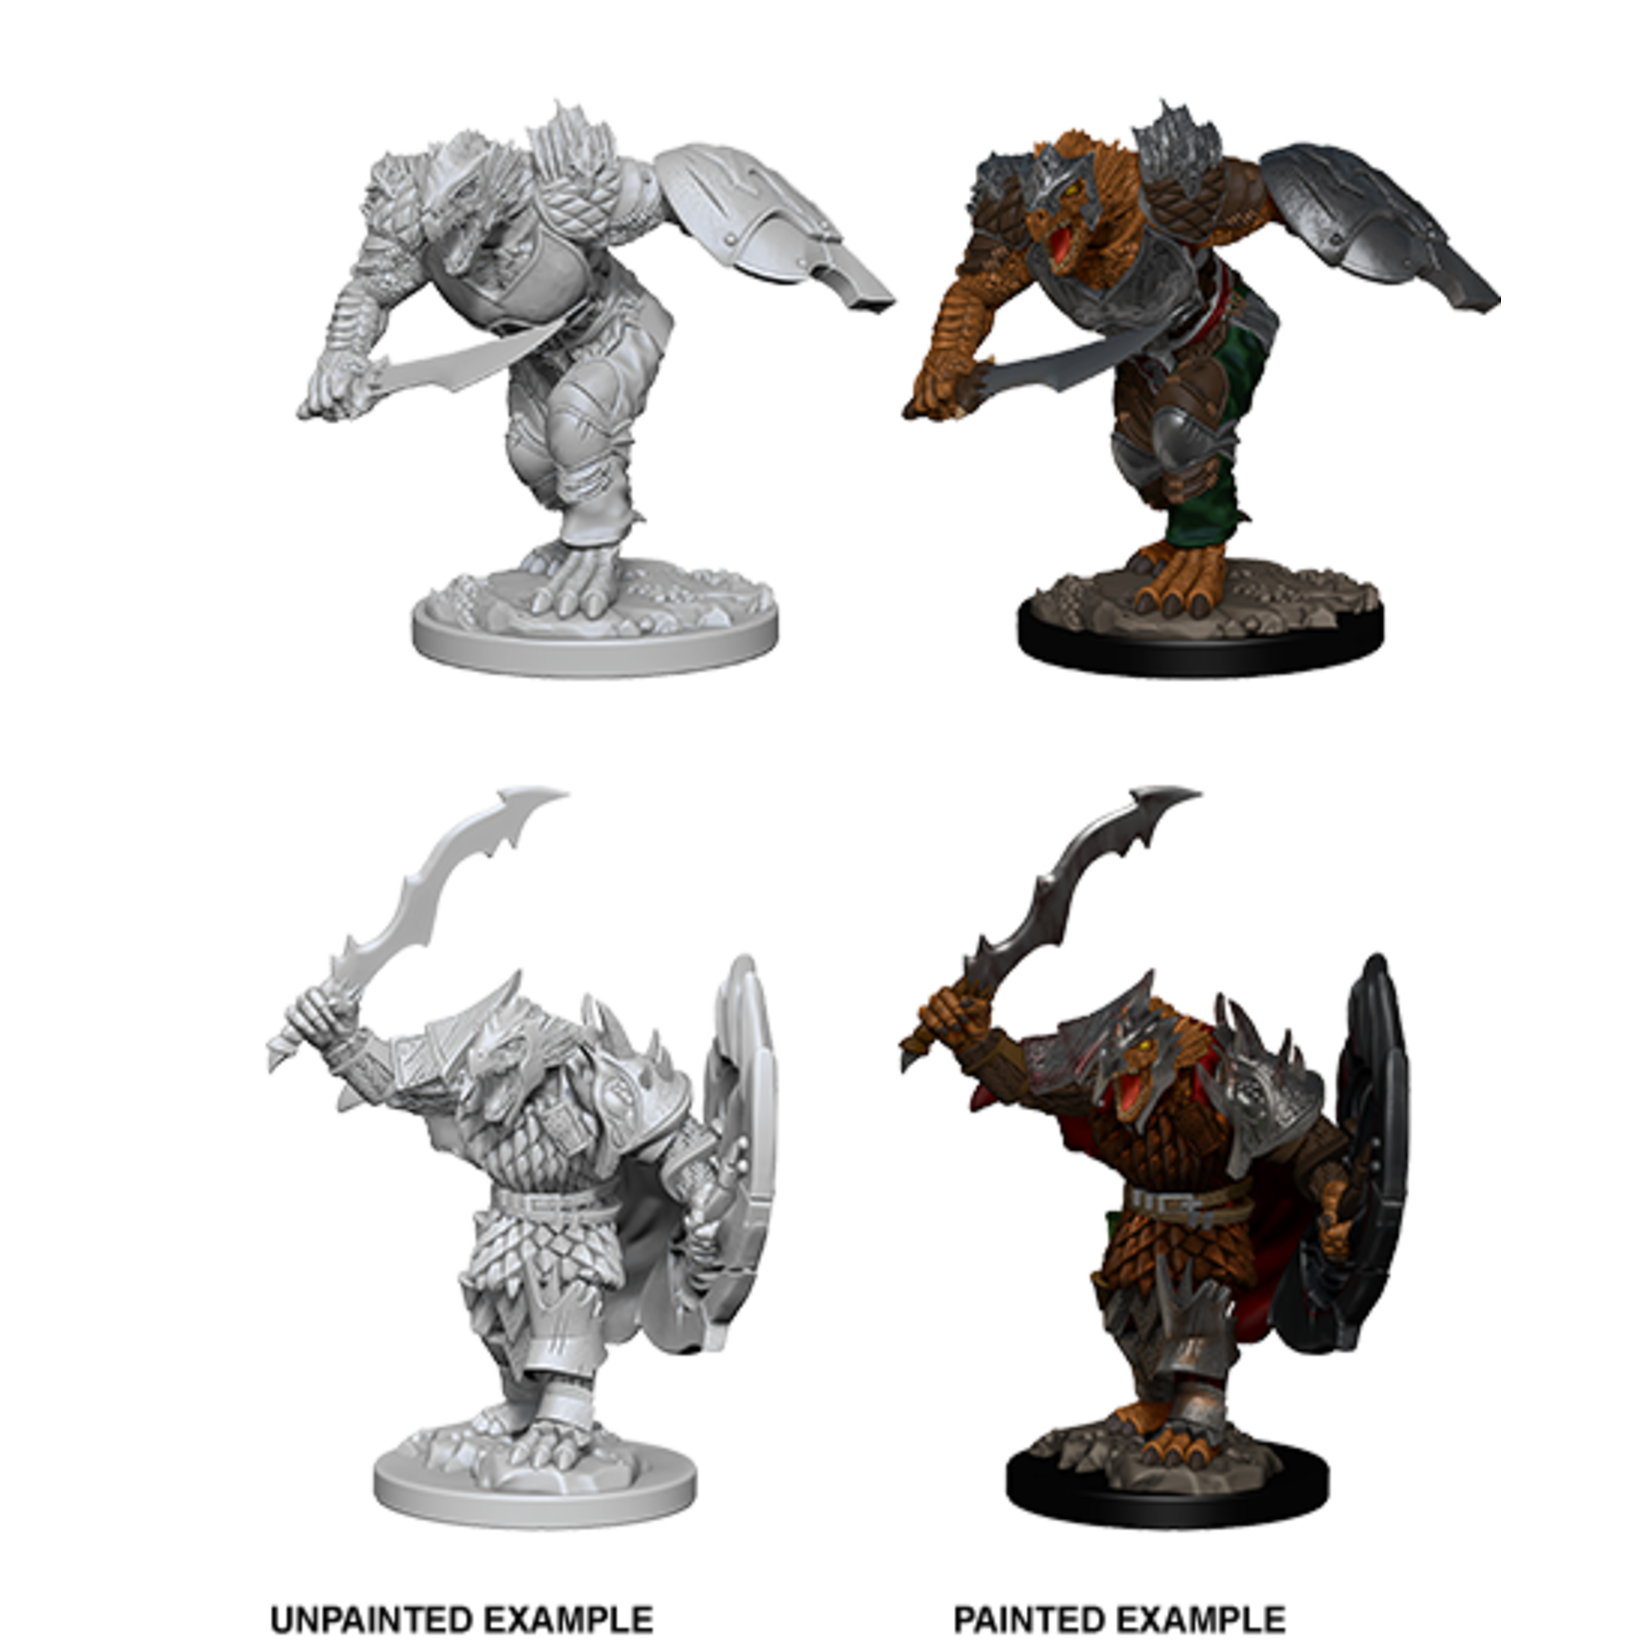 WizKids D&D Nolzur's Marvelous Miniatures: Dragonborn Fighter with Sword & Shield (W4)